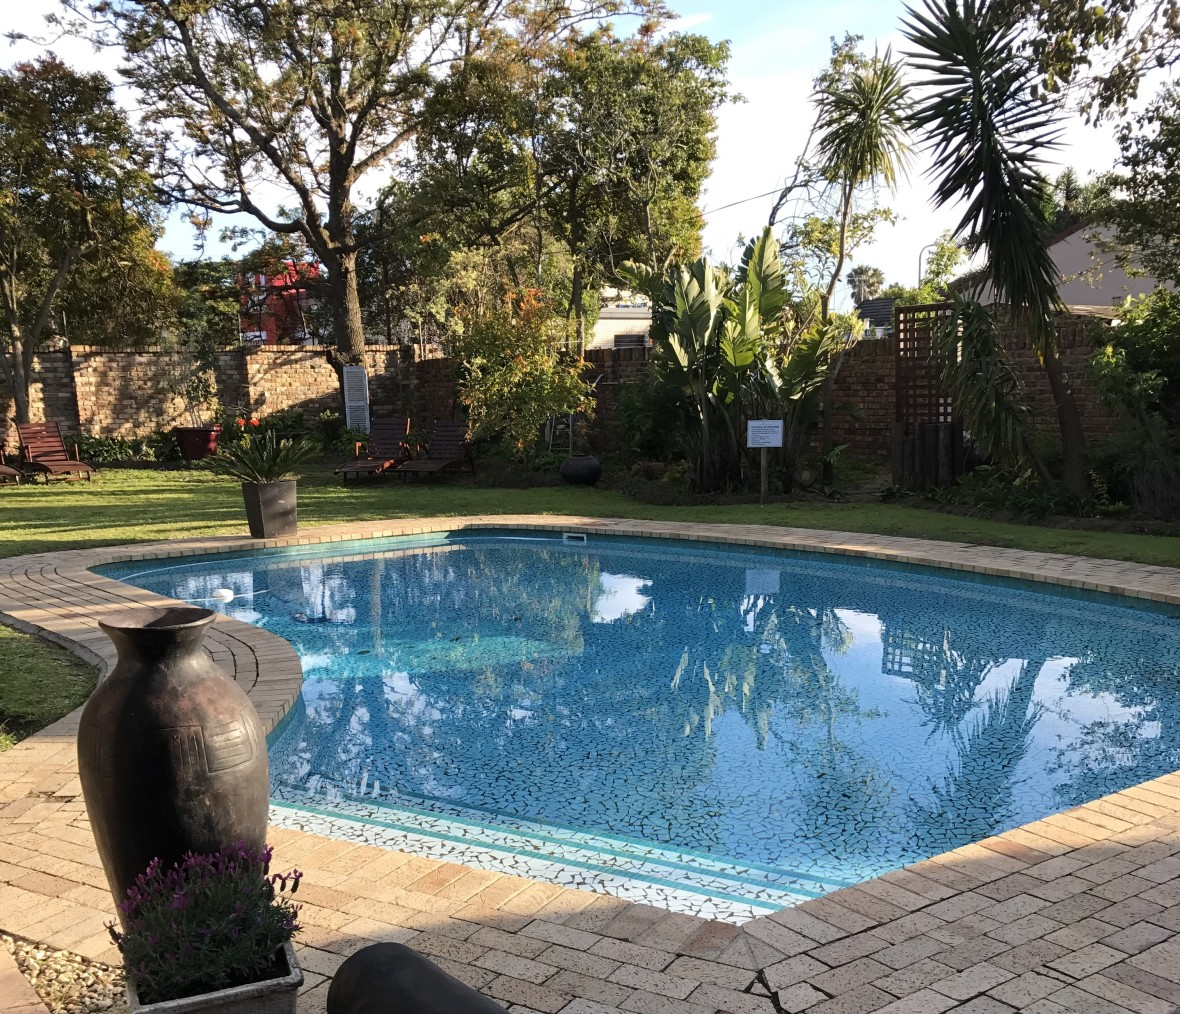 amani-guest-lodge-port-elizabeth-south-africa